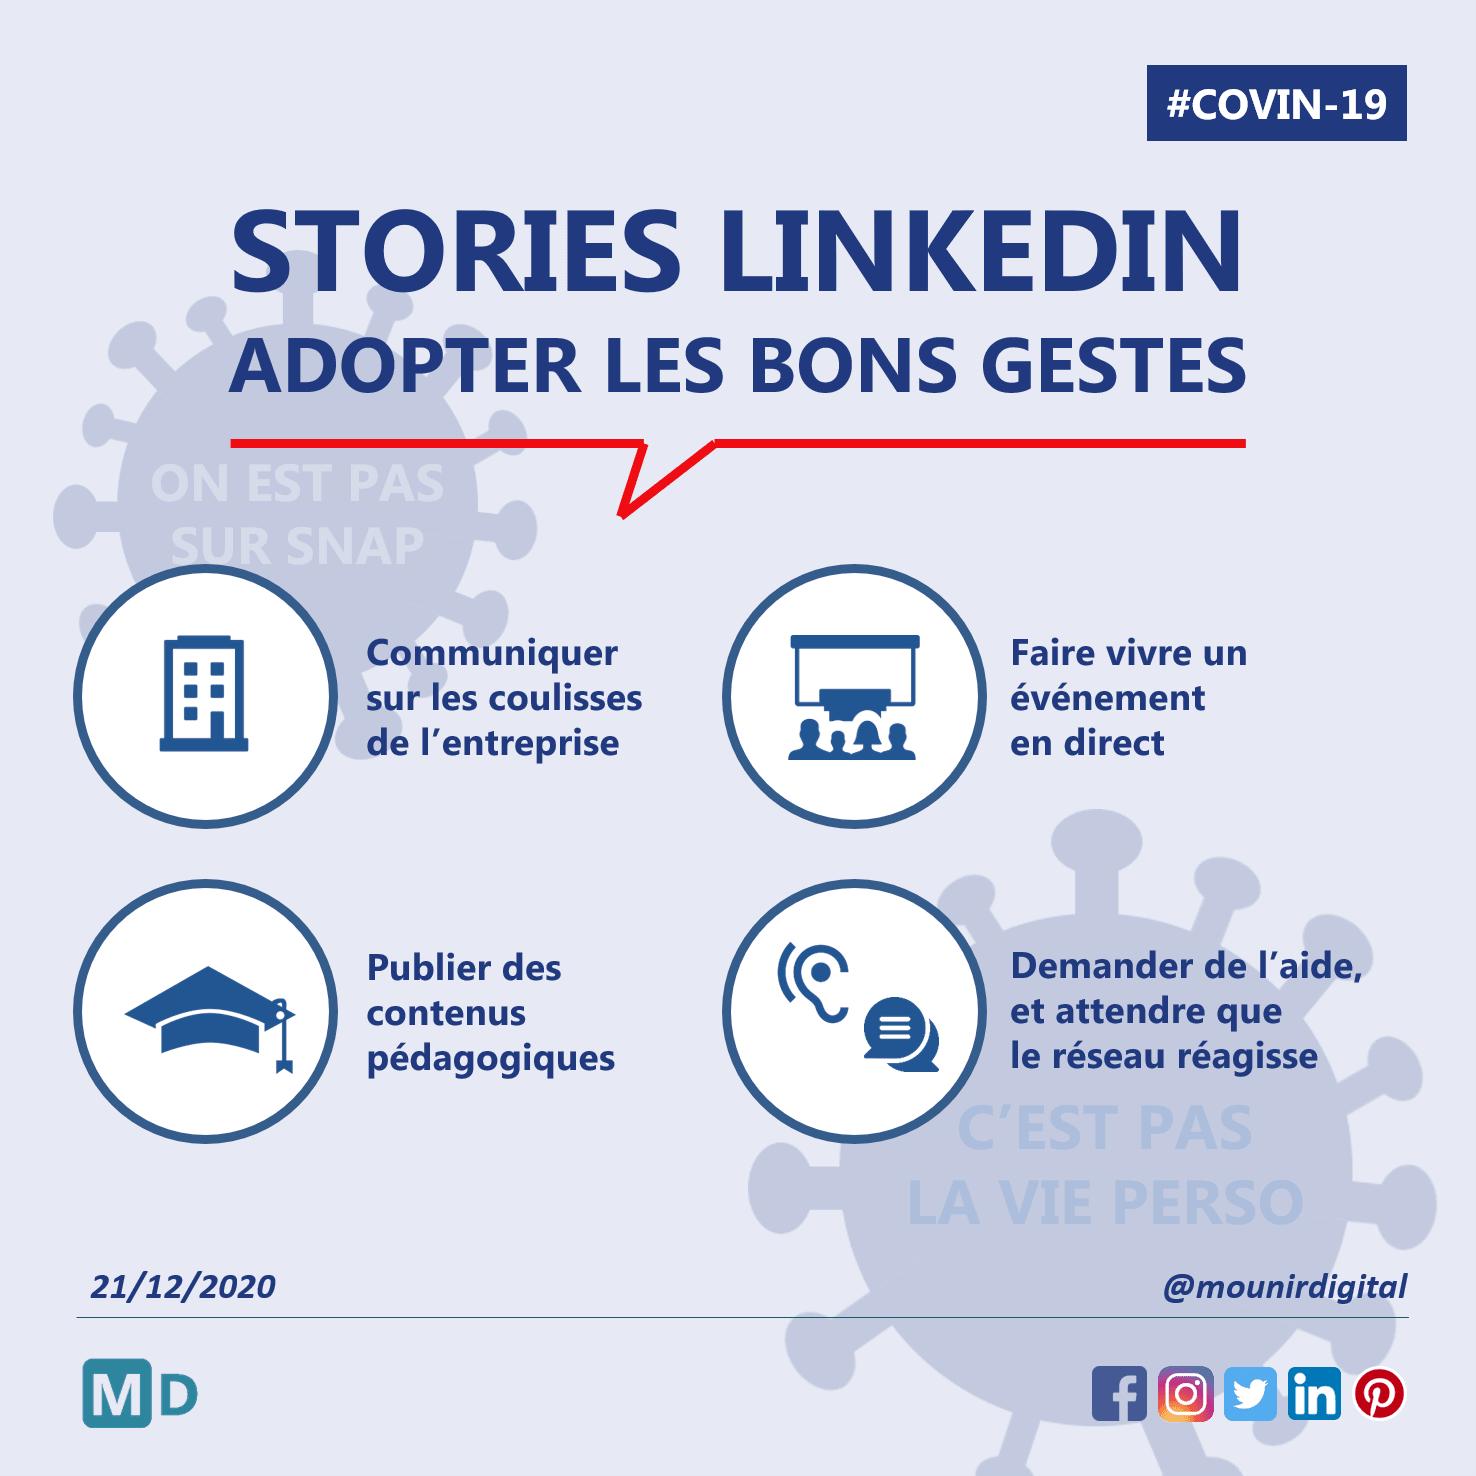 Story Linkedin - Adopter les bons gestes - Mounir Digital